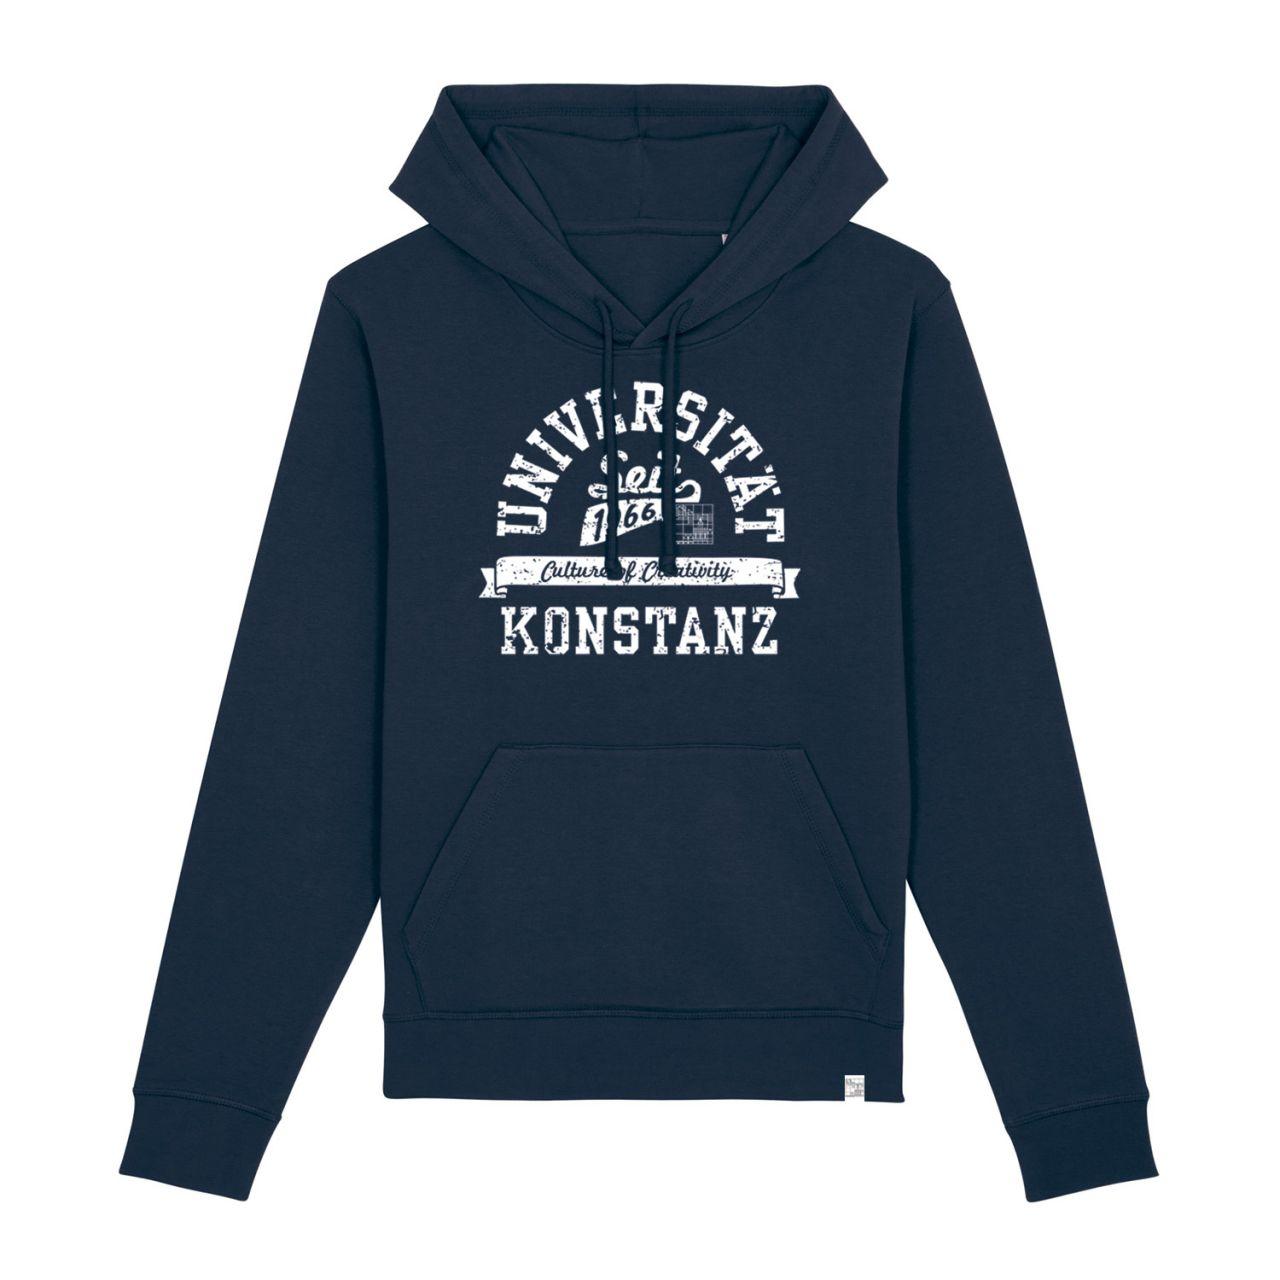 Unisex Organic Hooded Sweatshirt, navy, berkley